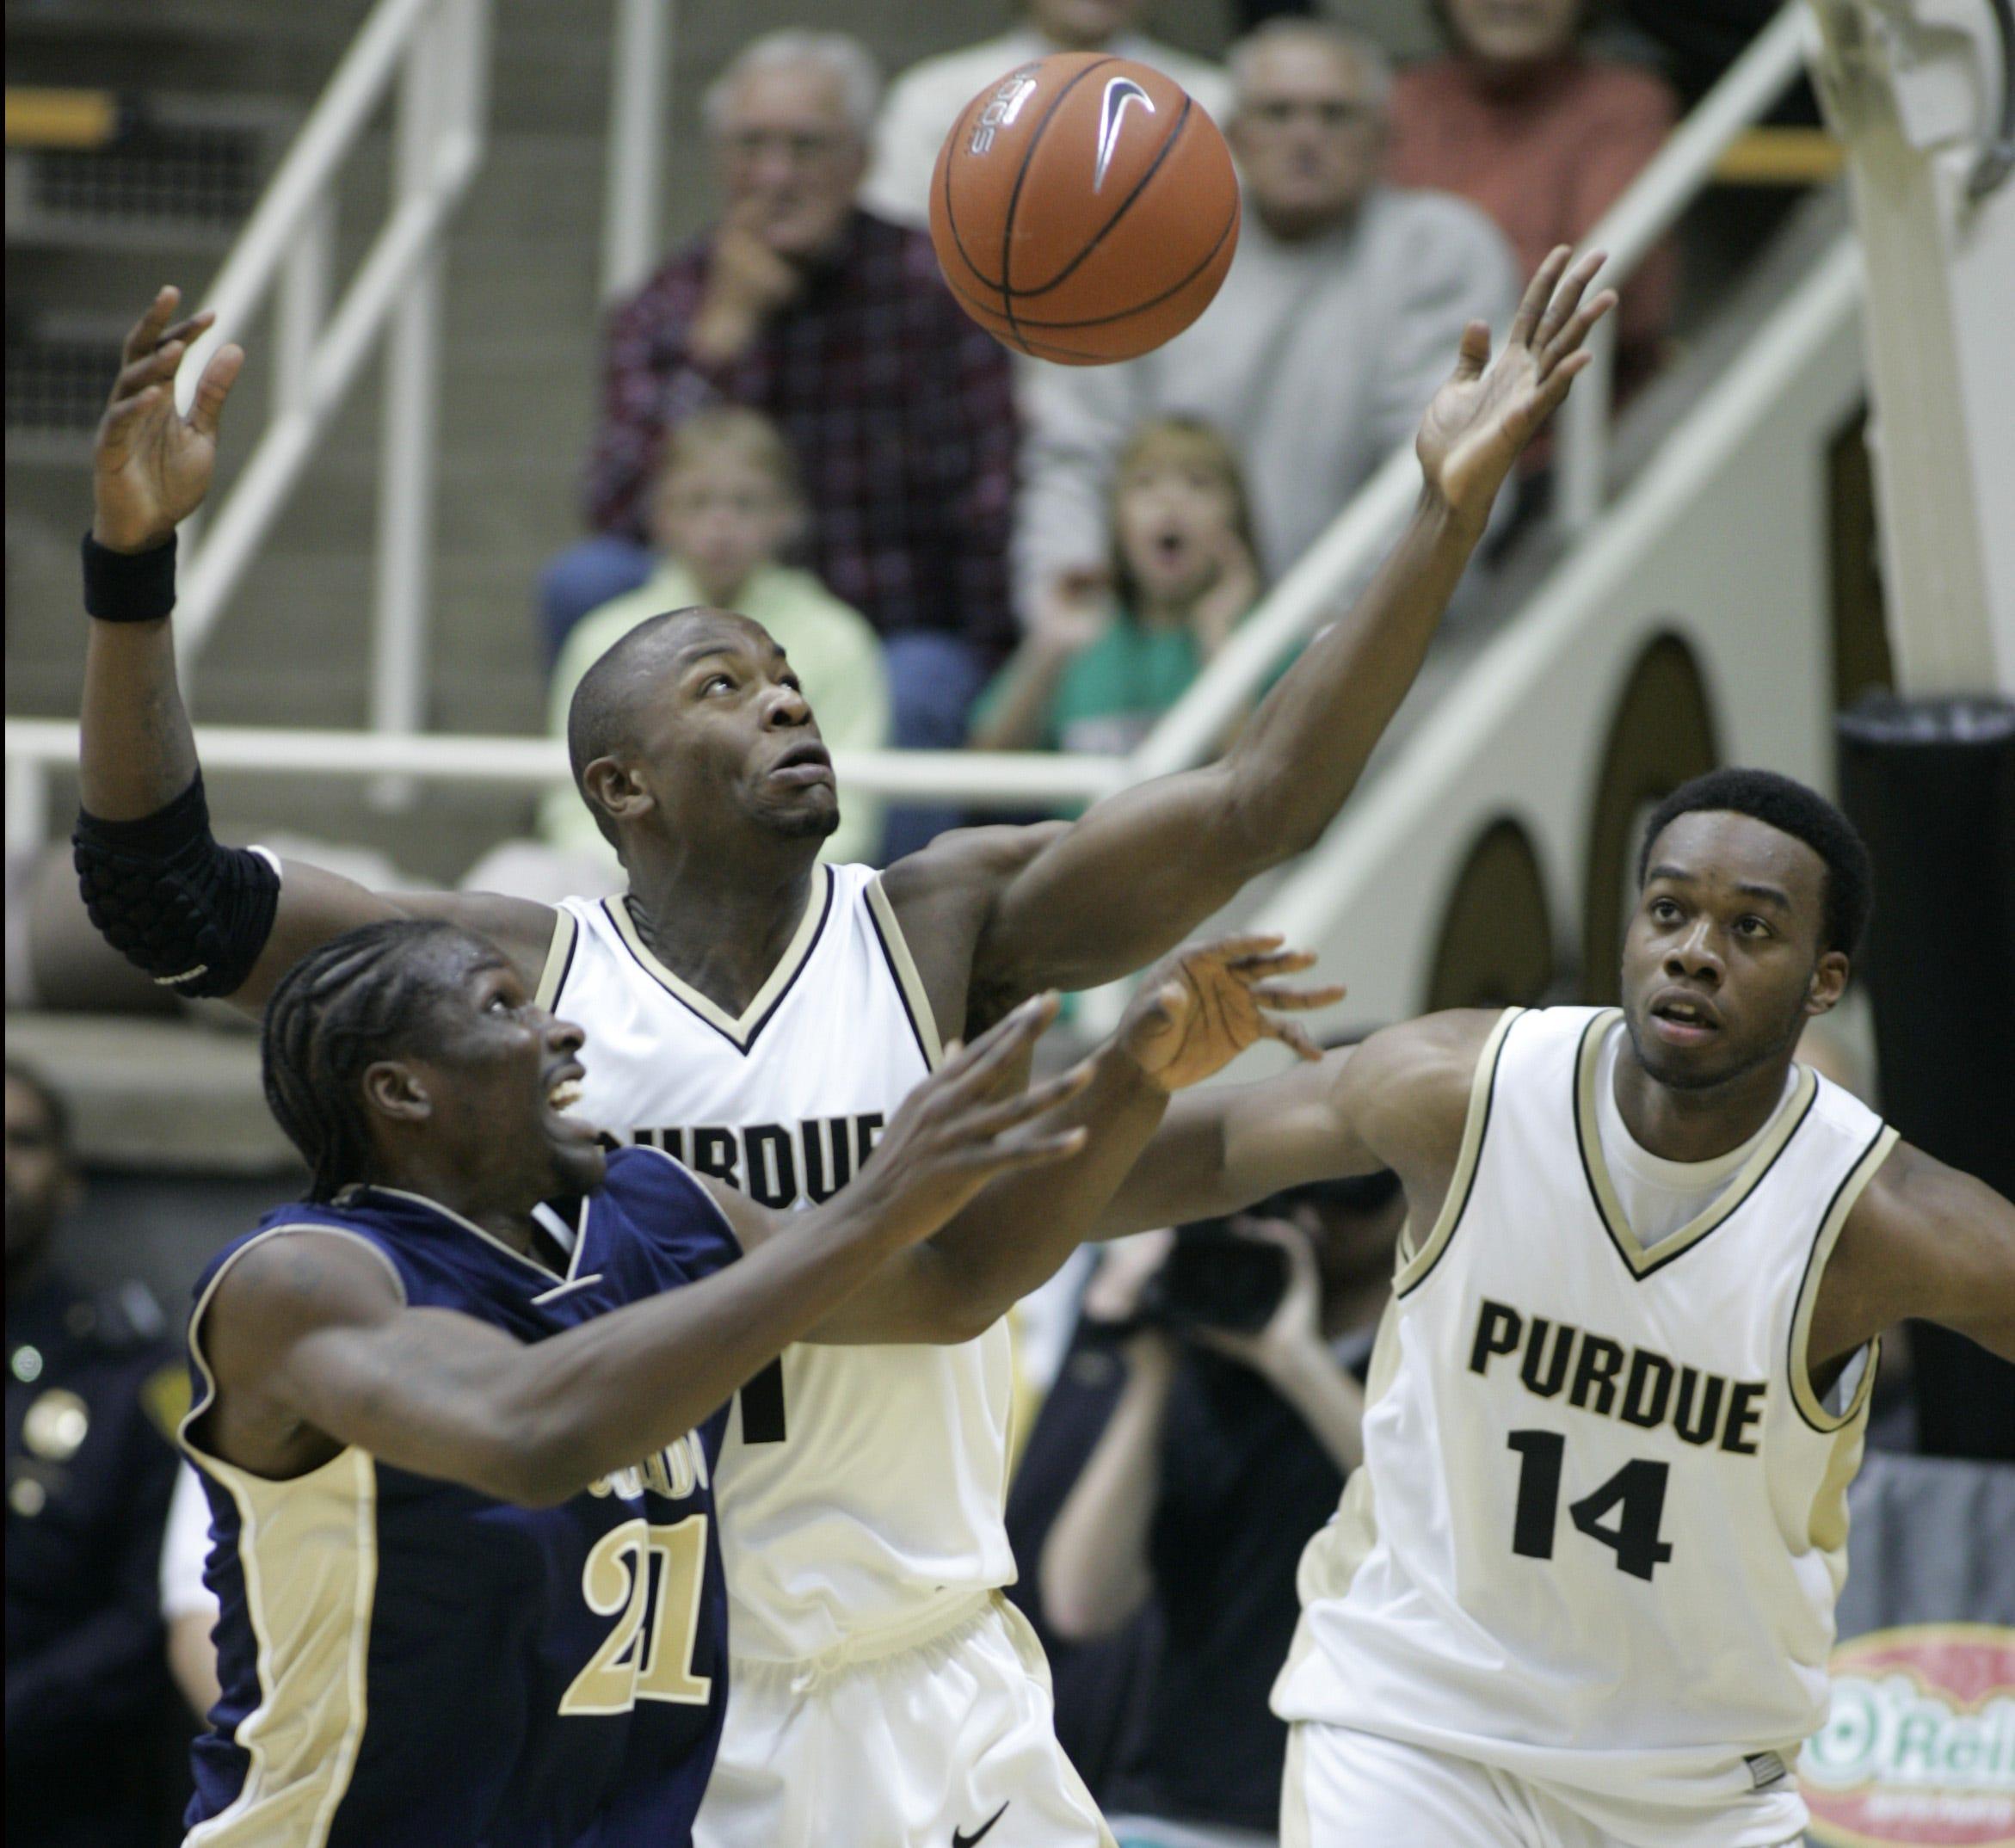 Purdue forward Gordon Watt, center, battles for a rebound.